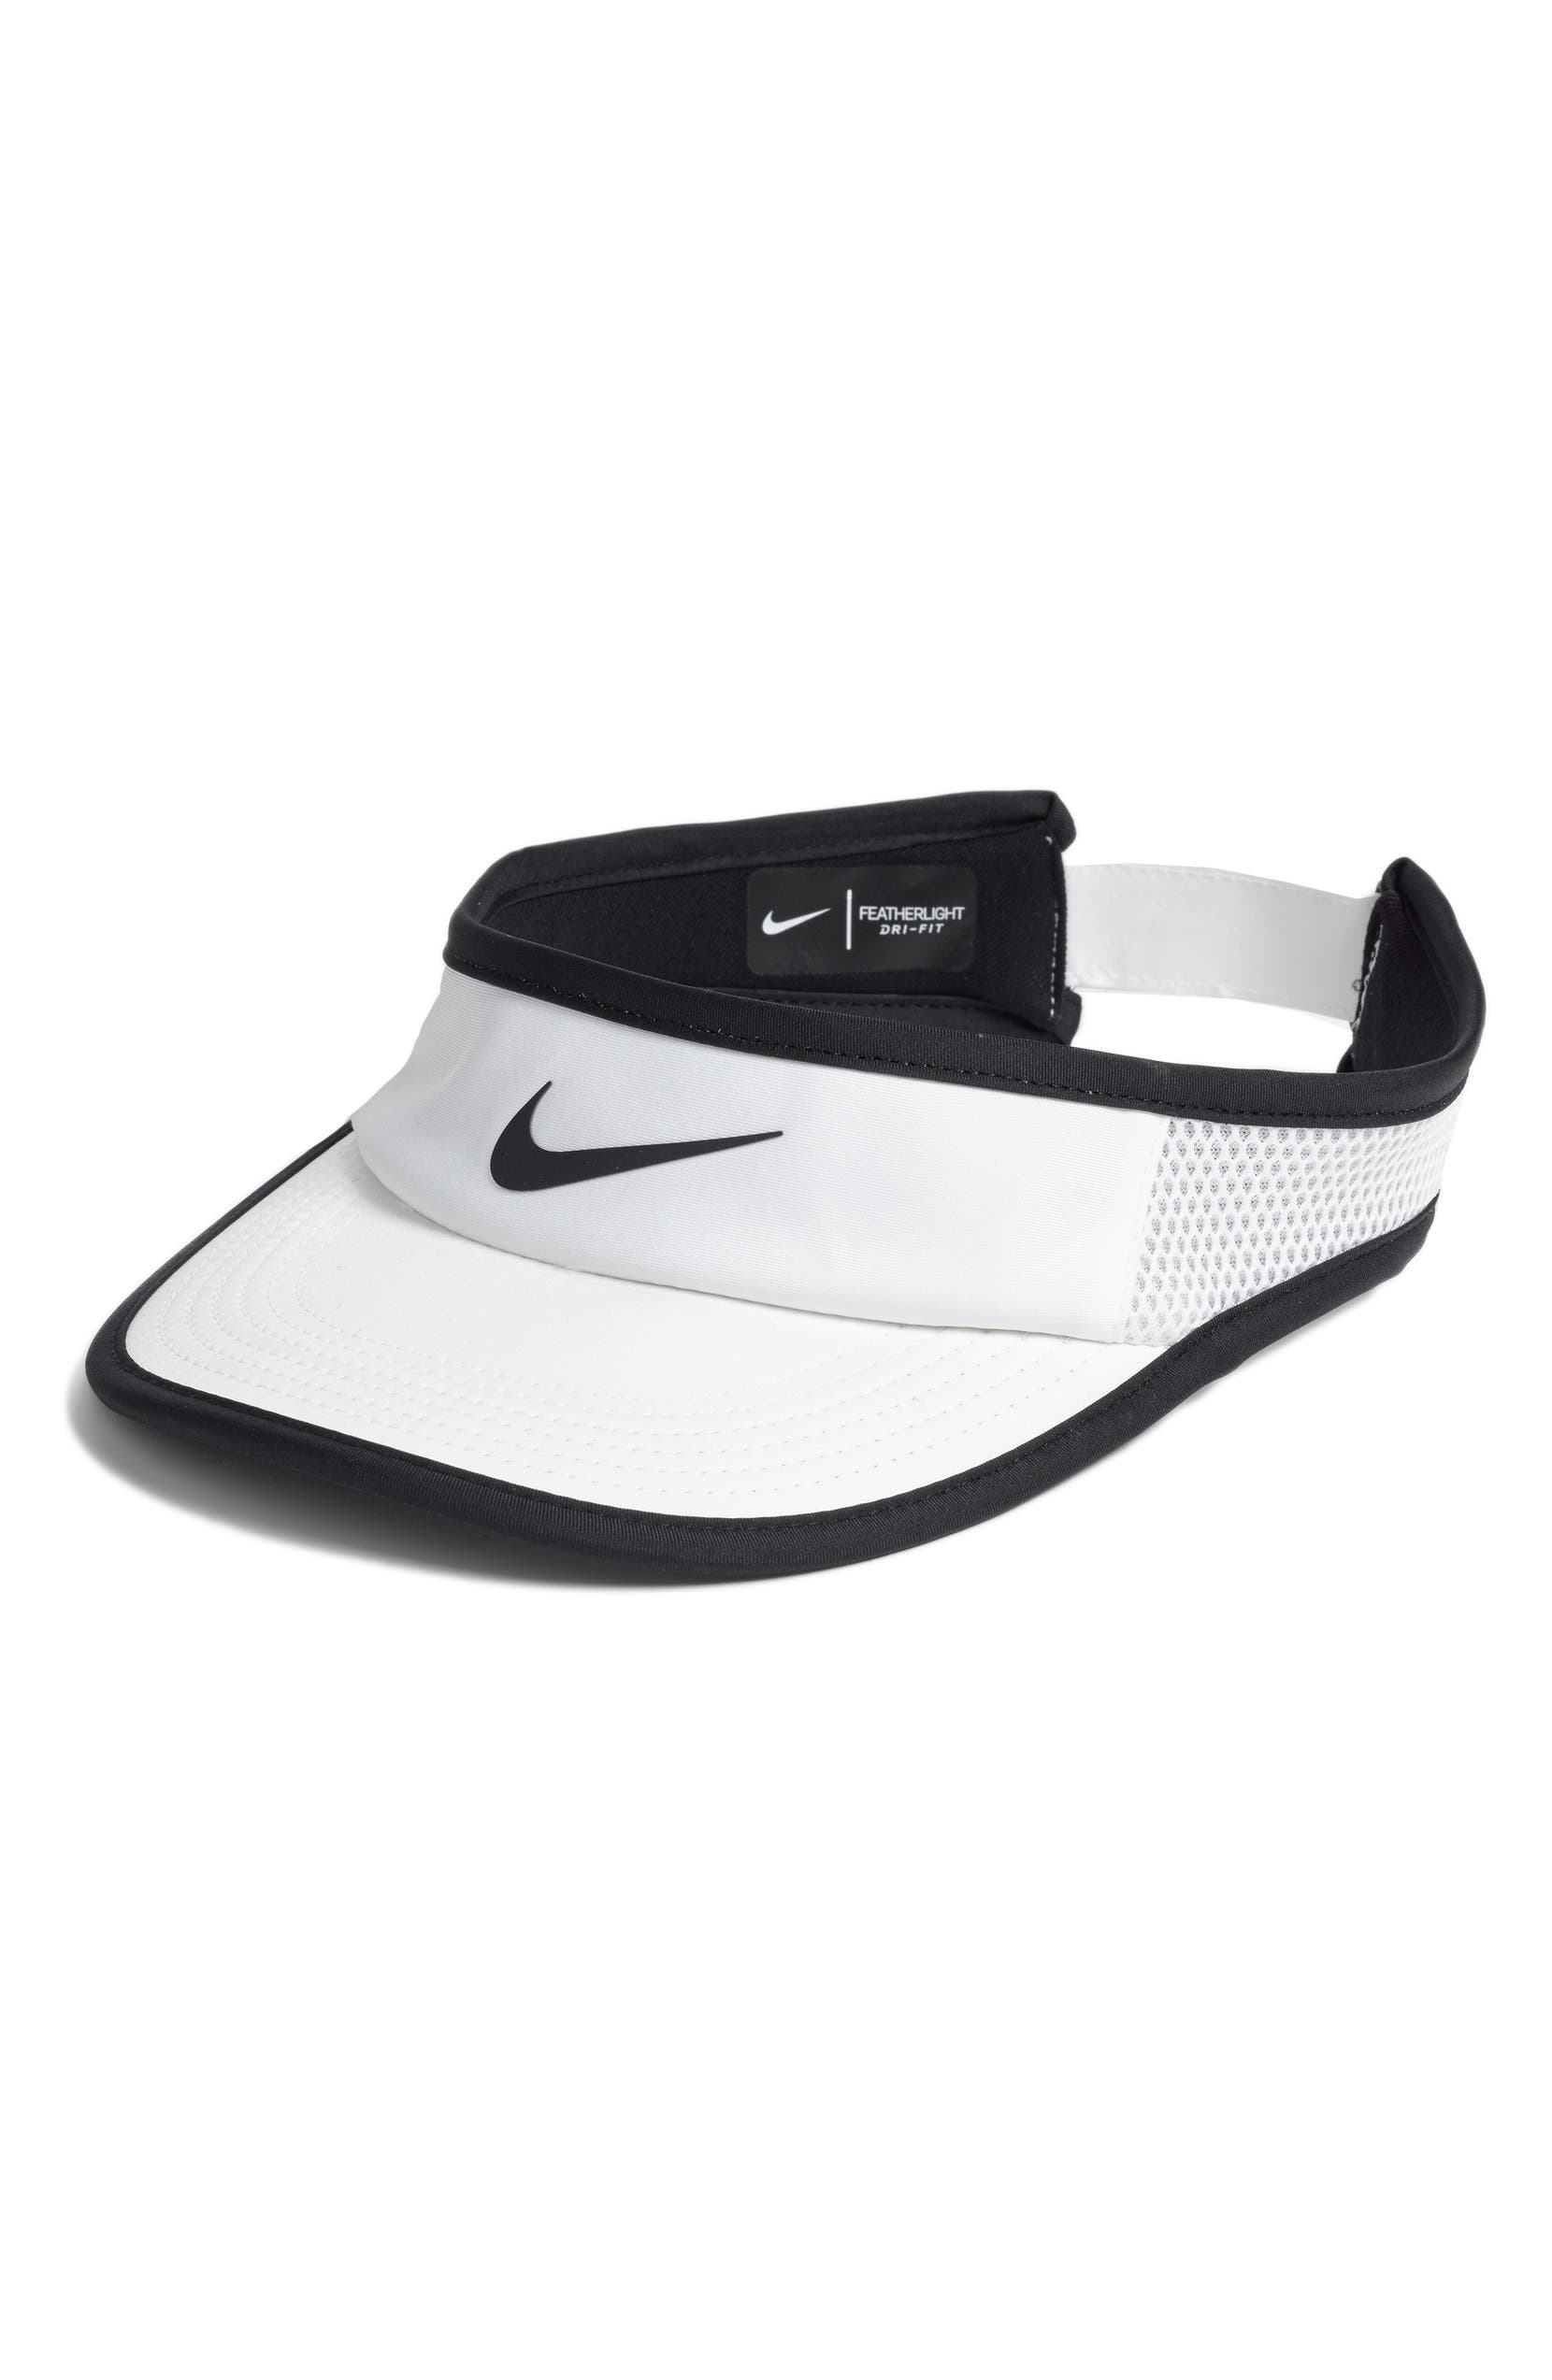 Nike Court AeroBill Tennis Visor  9ee9e2fc416